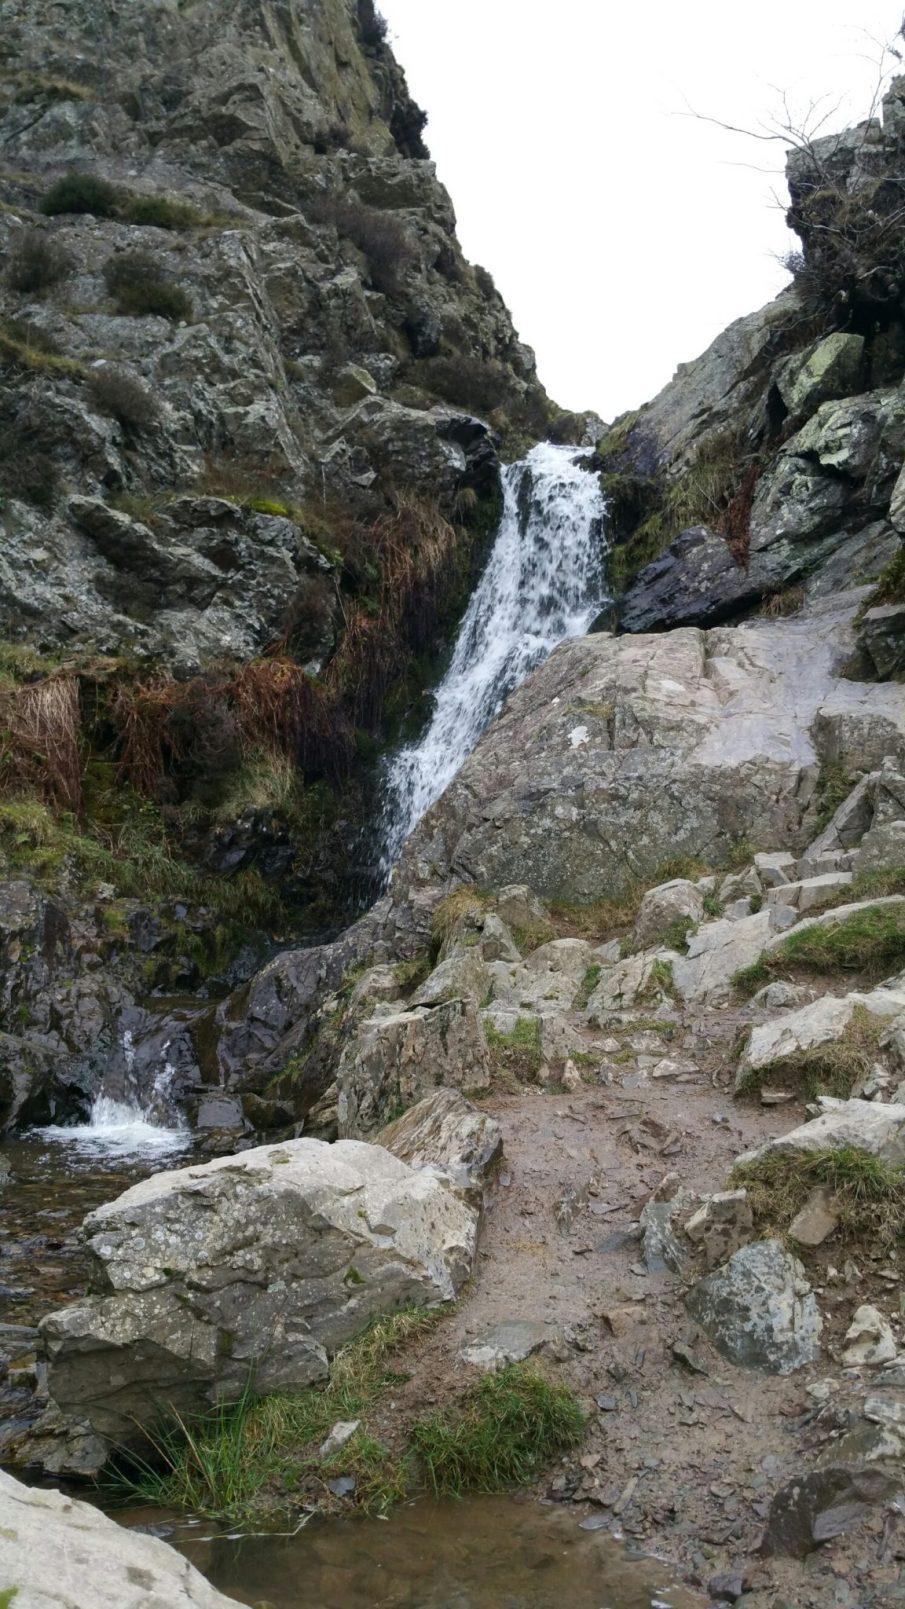 Lightspout Waterfall